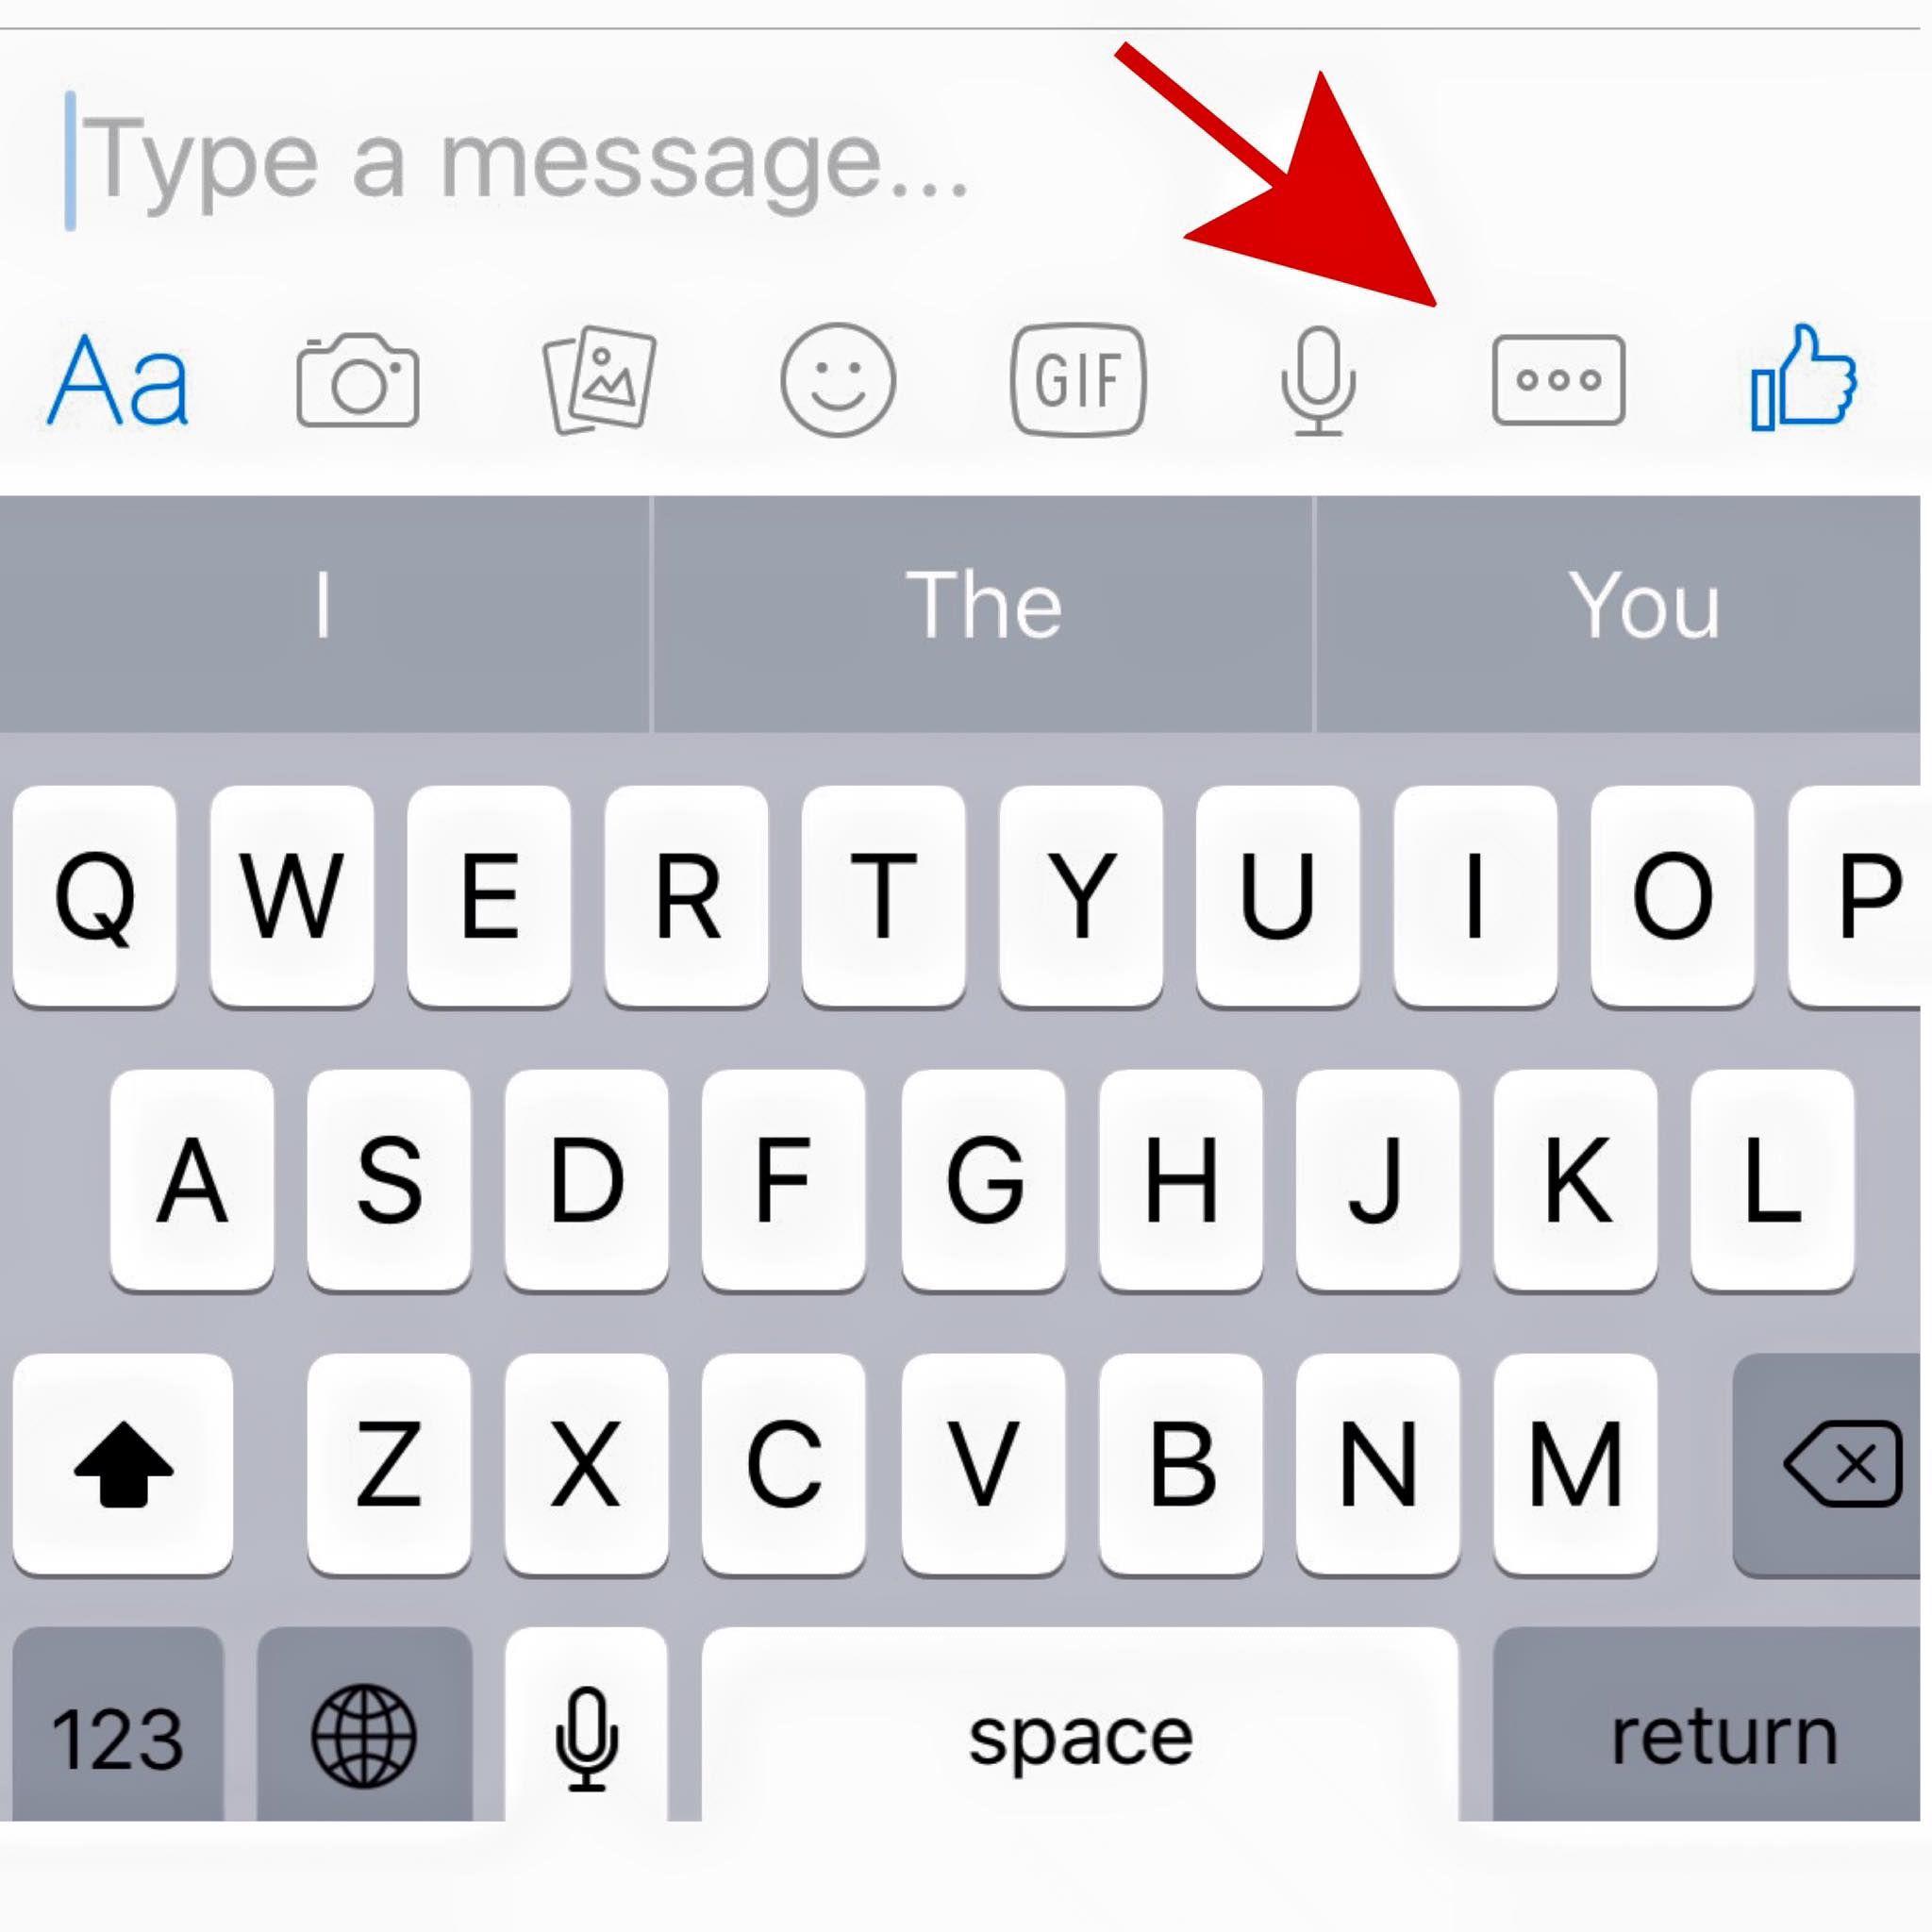 Top 20 Facebook Messenger Tips Amp Tricks You May Not Know How To Use Facebook Facebook Messenger Facebook Help